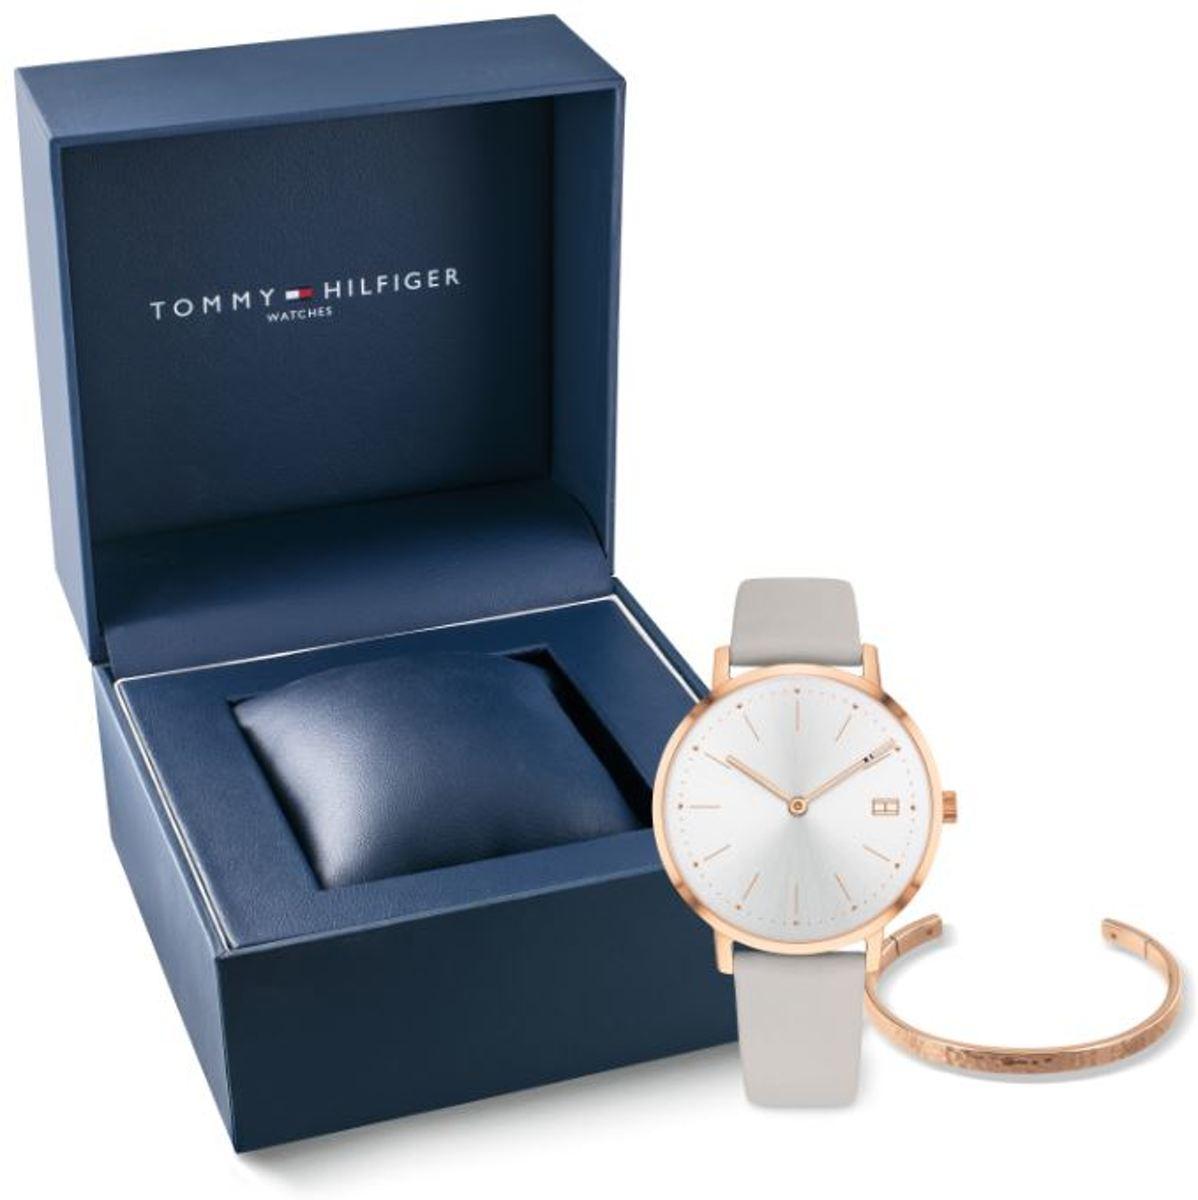 Tommy Hilfiger TH2770028 Giftset horloge dames - grijs - staal kopen